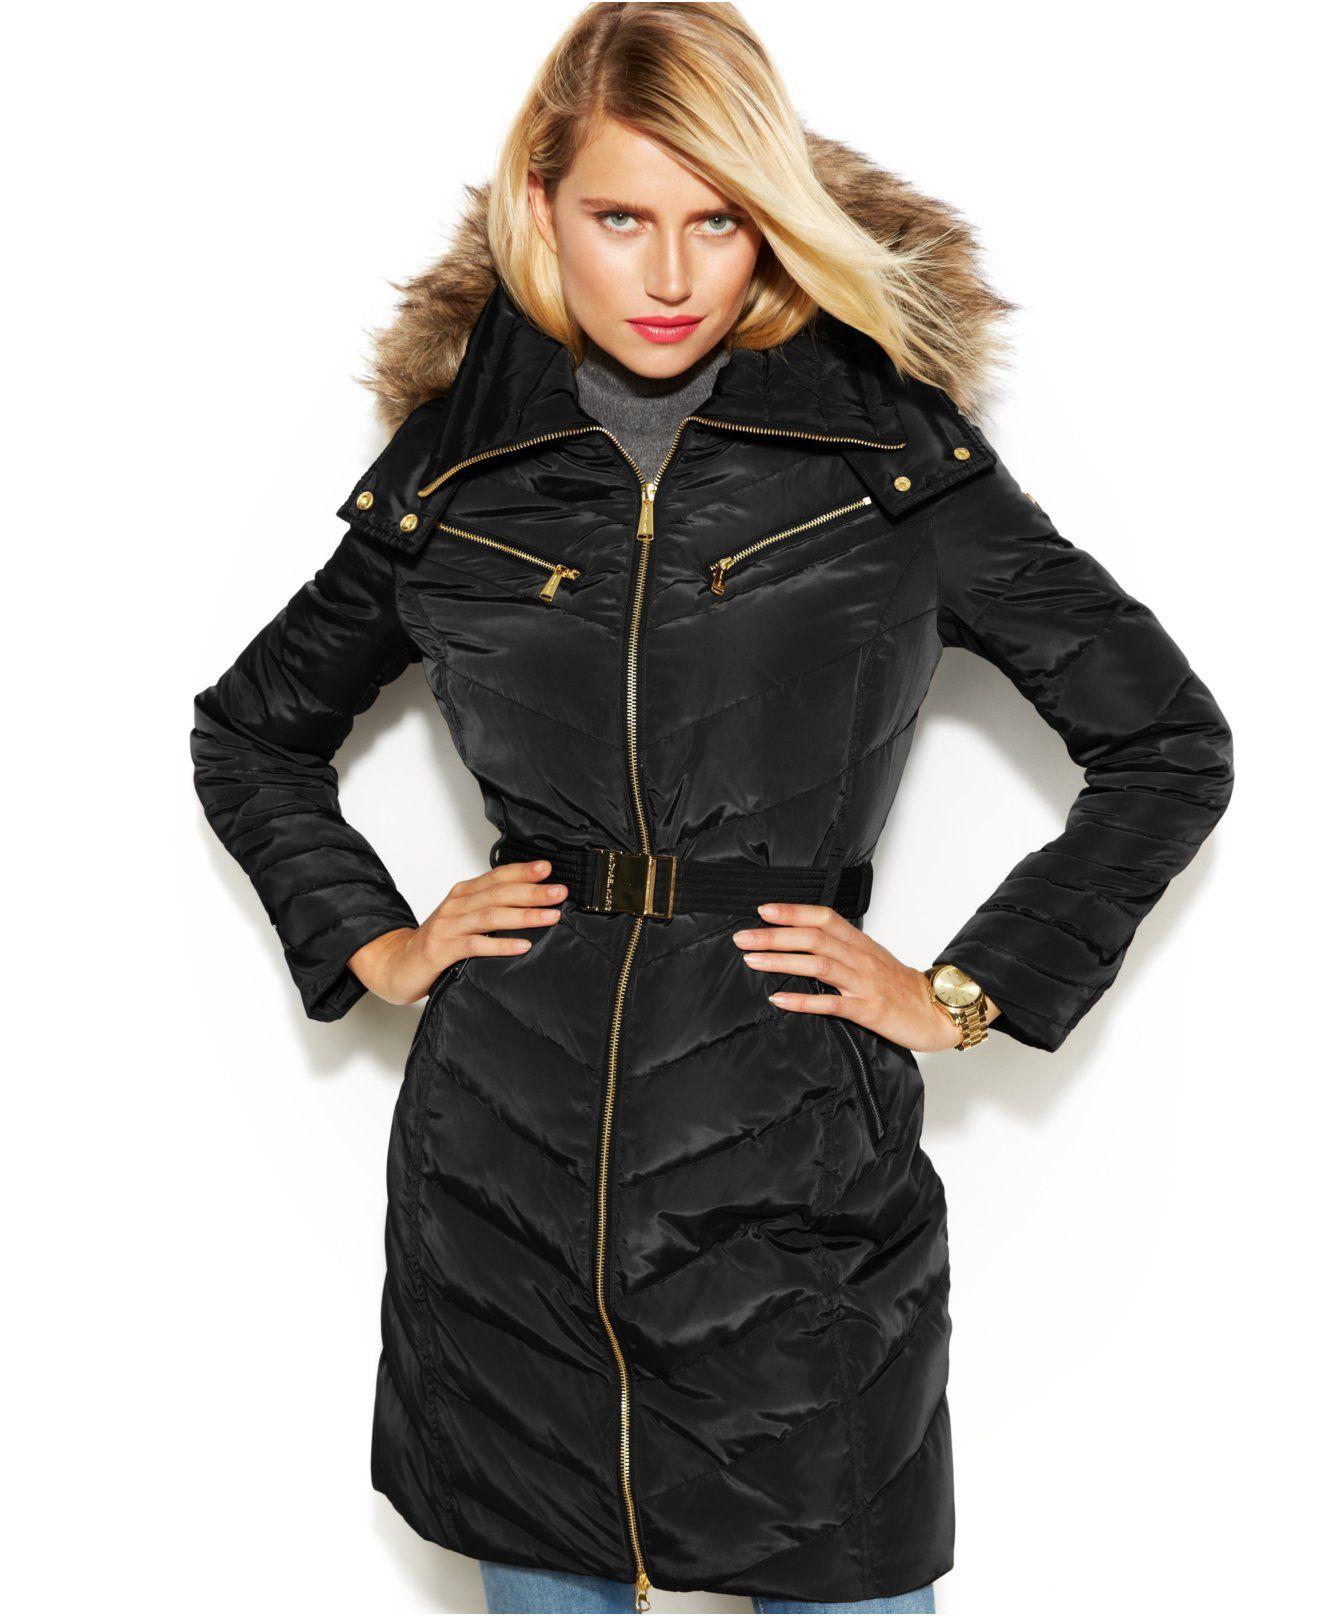 d41e275aab2 MICHAEL Michael Kors Petite Hooded Faux-Fur-Trim Belted Down Puffer Coat -  Coats - Women - Macy s